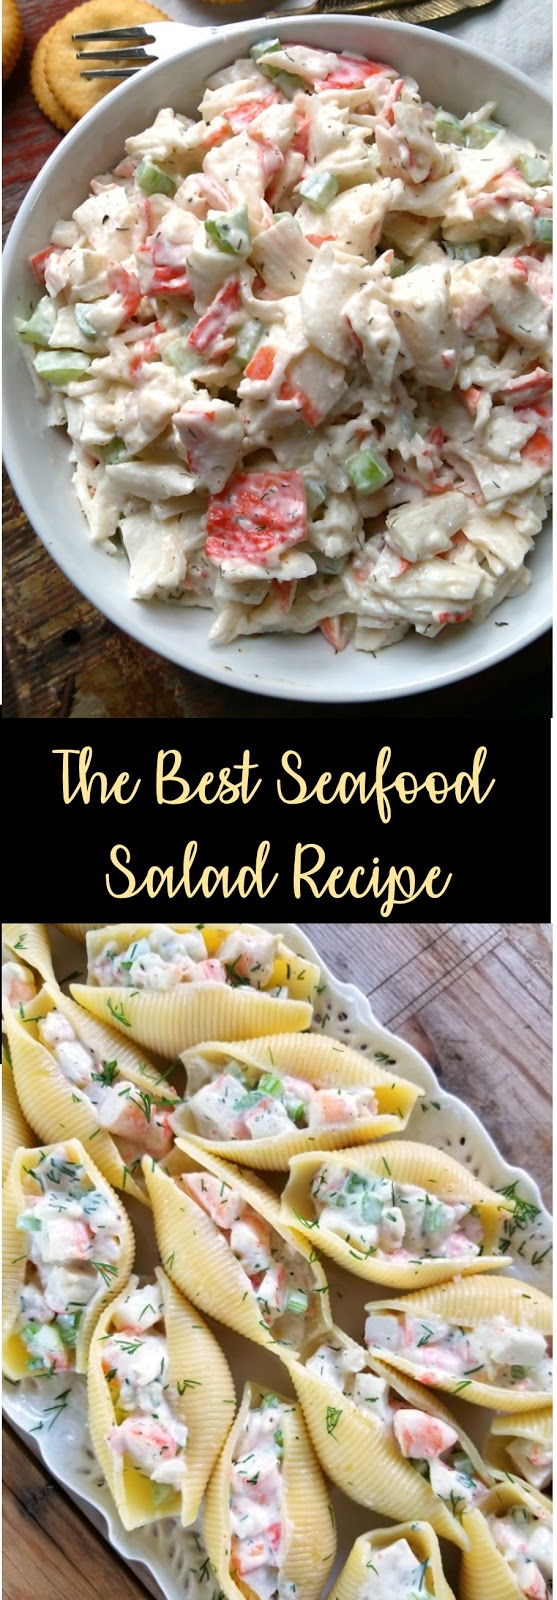 The Best Seafood Salad Recipe